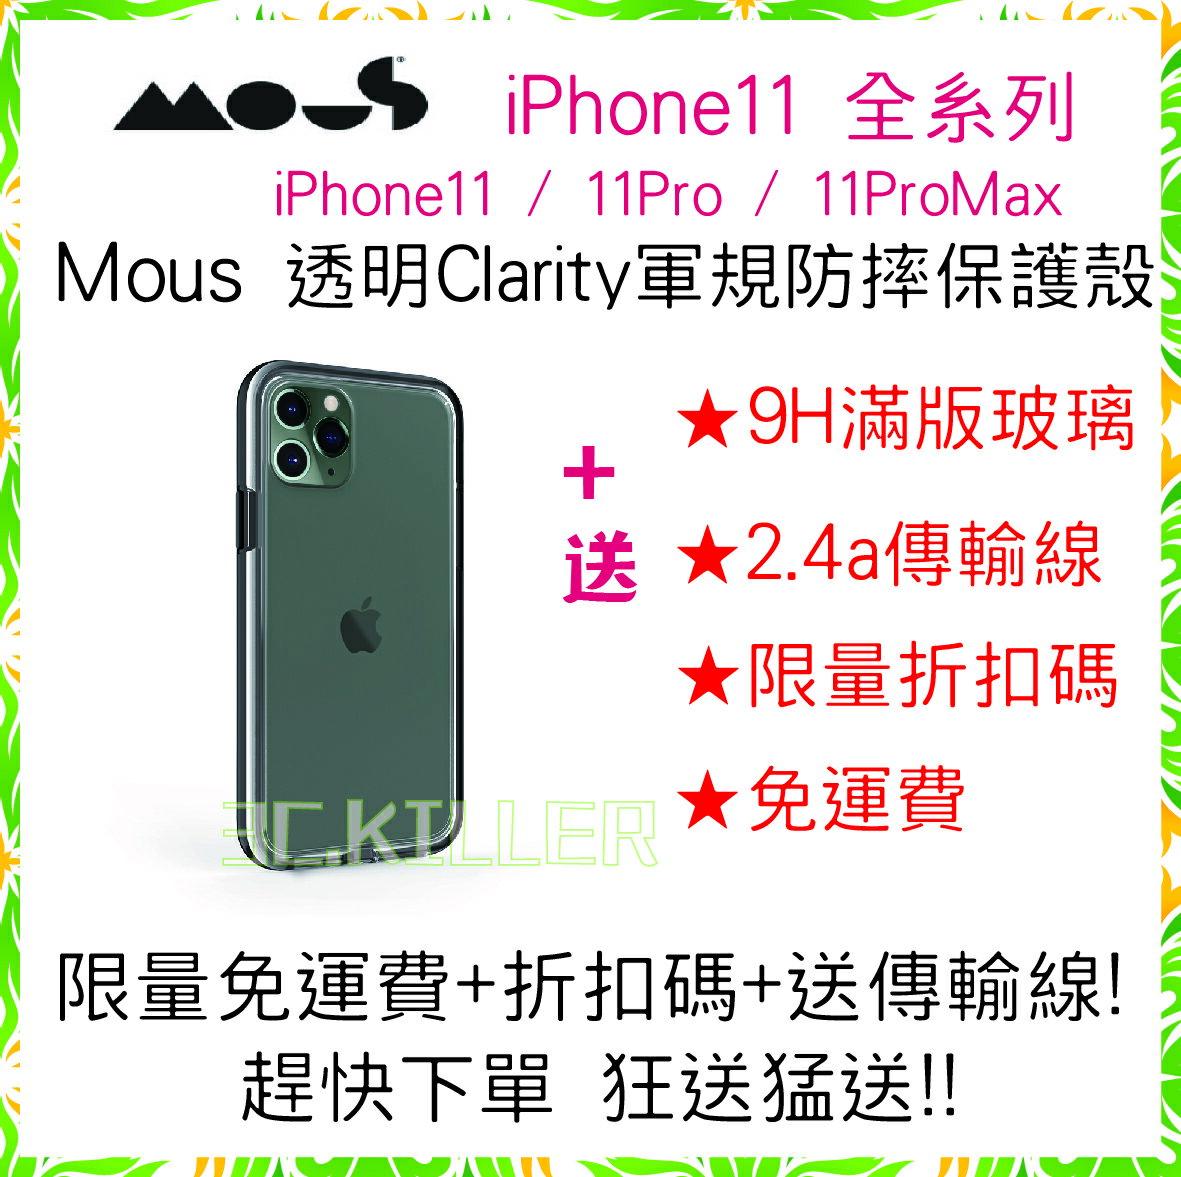 Mous iPhone11全系列 11Pro i11 ProMax 透明 Clarity 軍規防摔保護殼